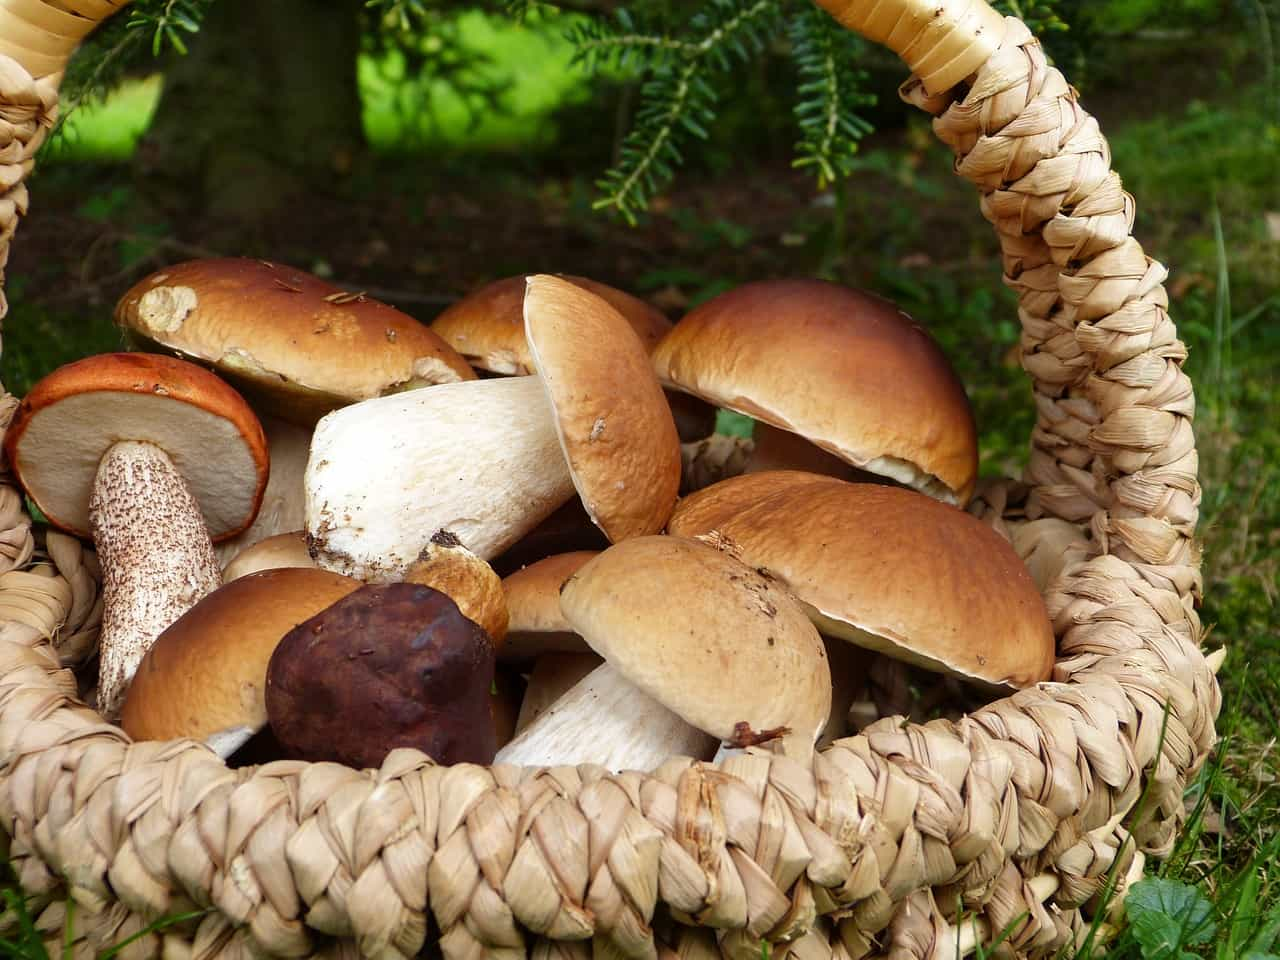 boschi funghi porcini italia